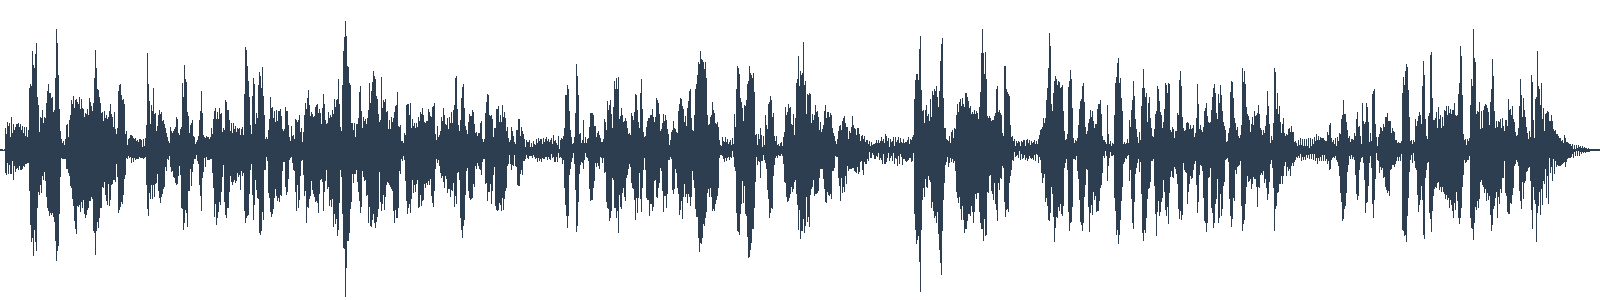 Rozhlasový spot Audioknihy NAHLAS! waveform